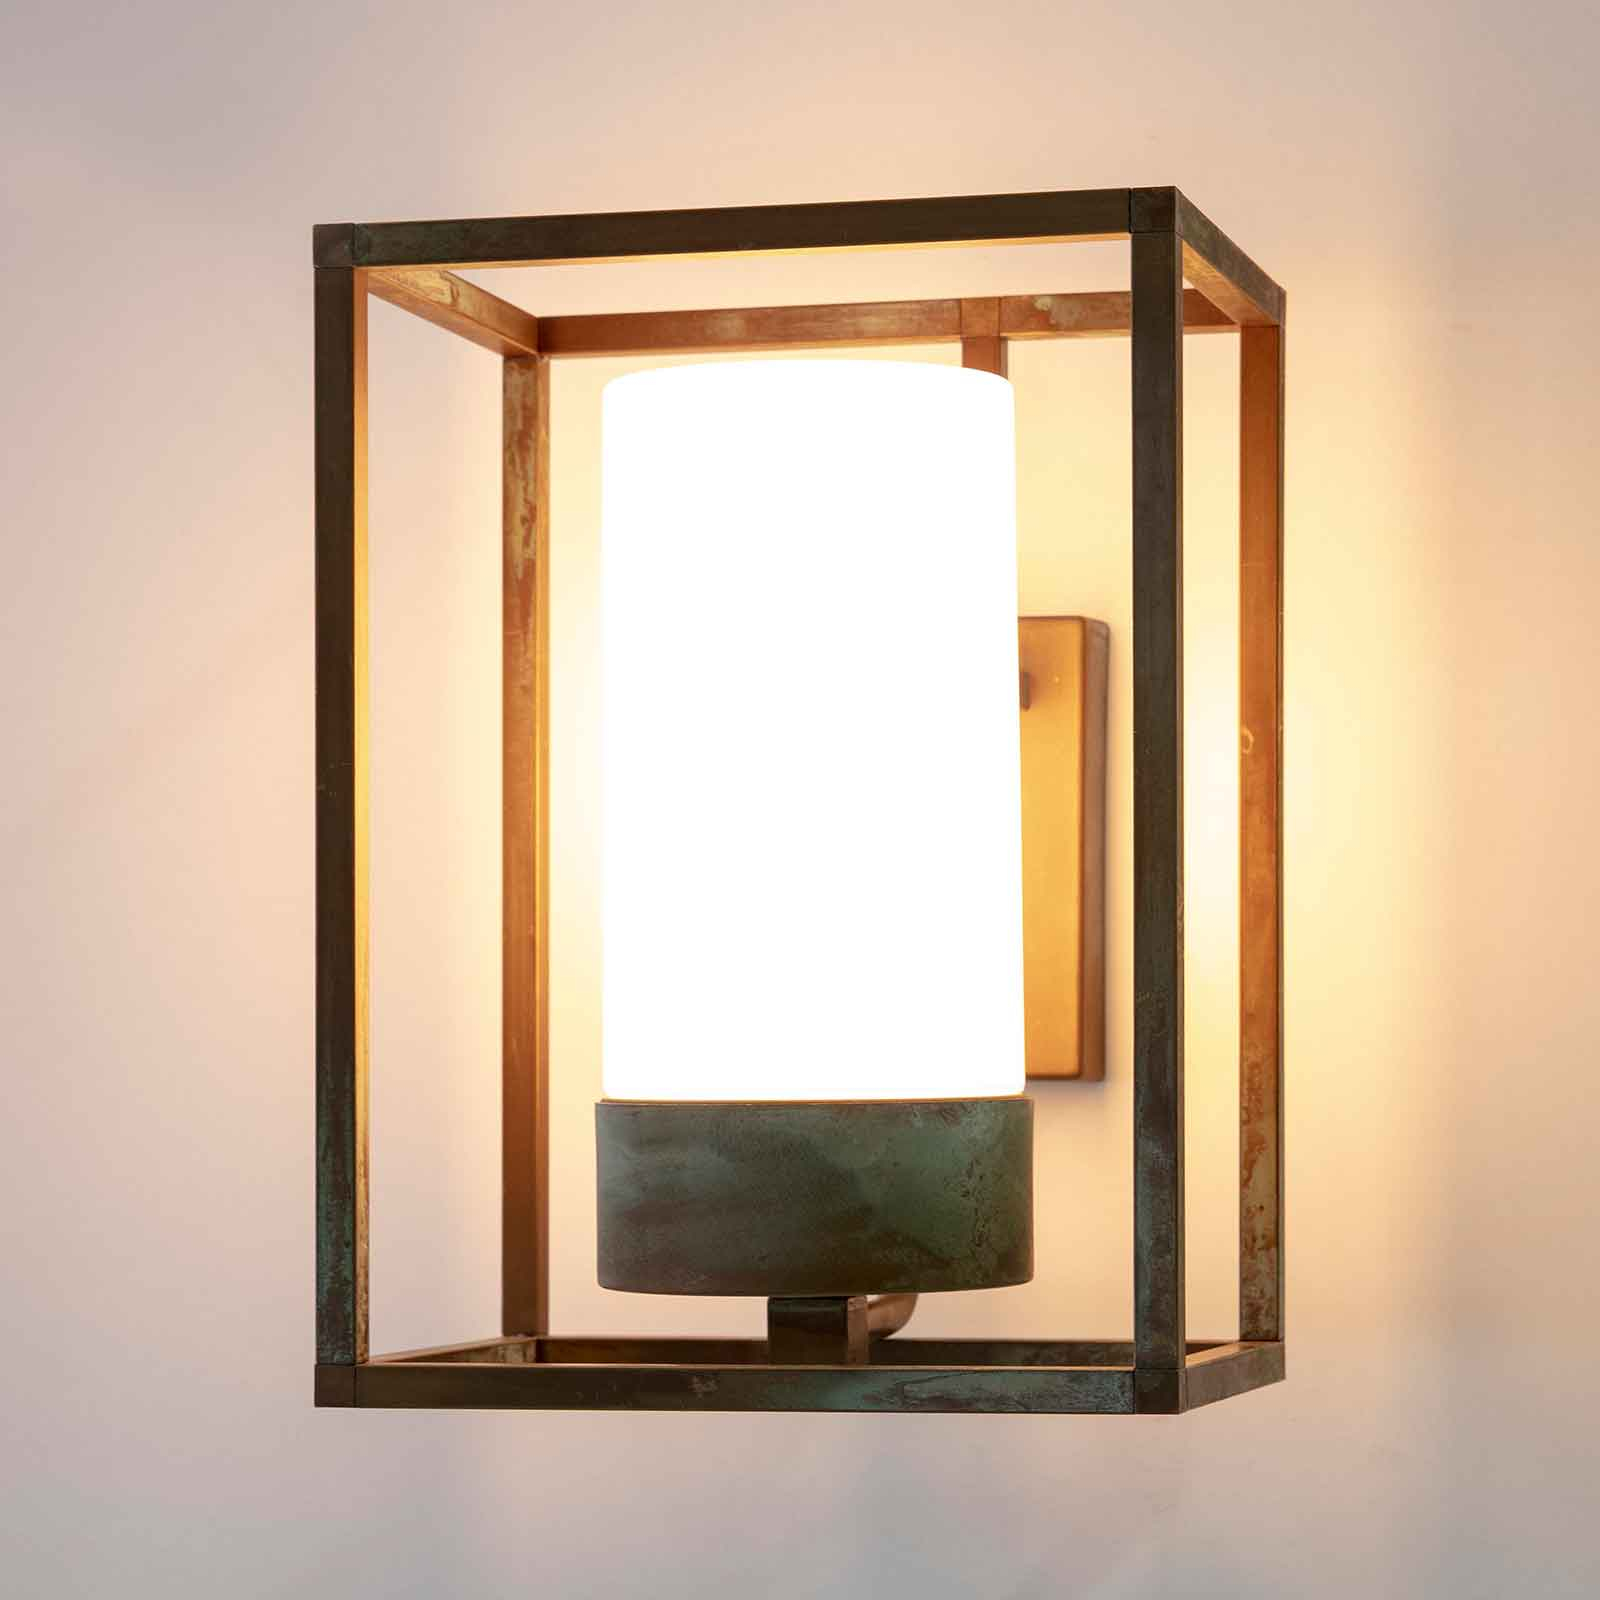 Ulkoseinälamppu Cubic³ 3363 messinki/opaali